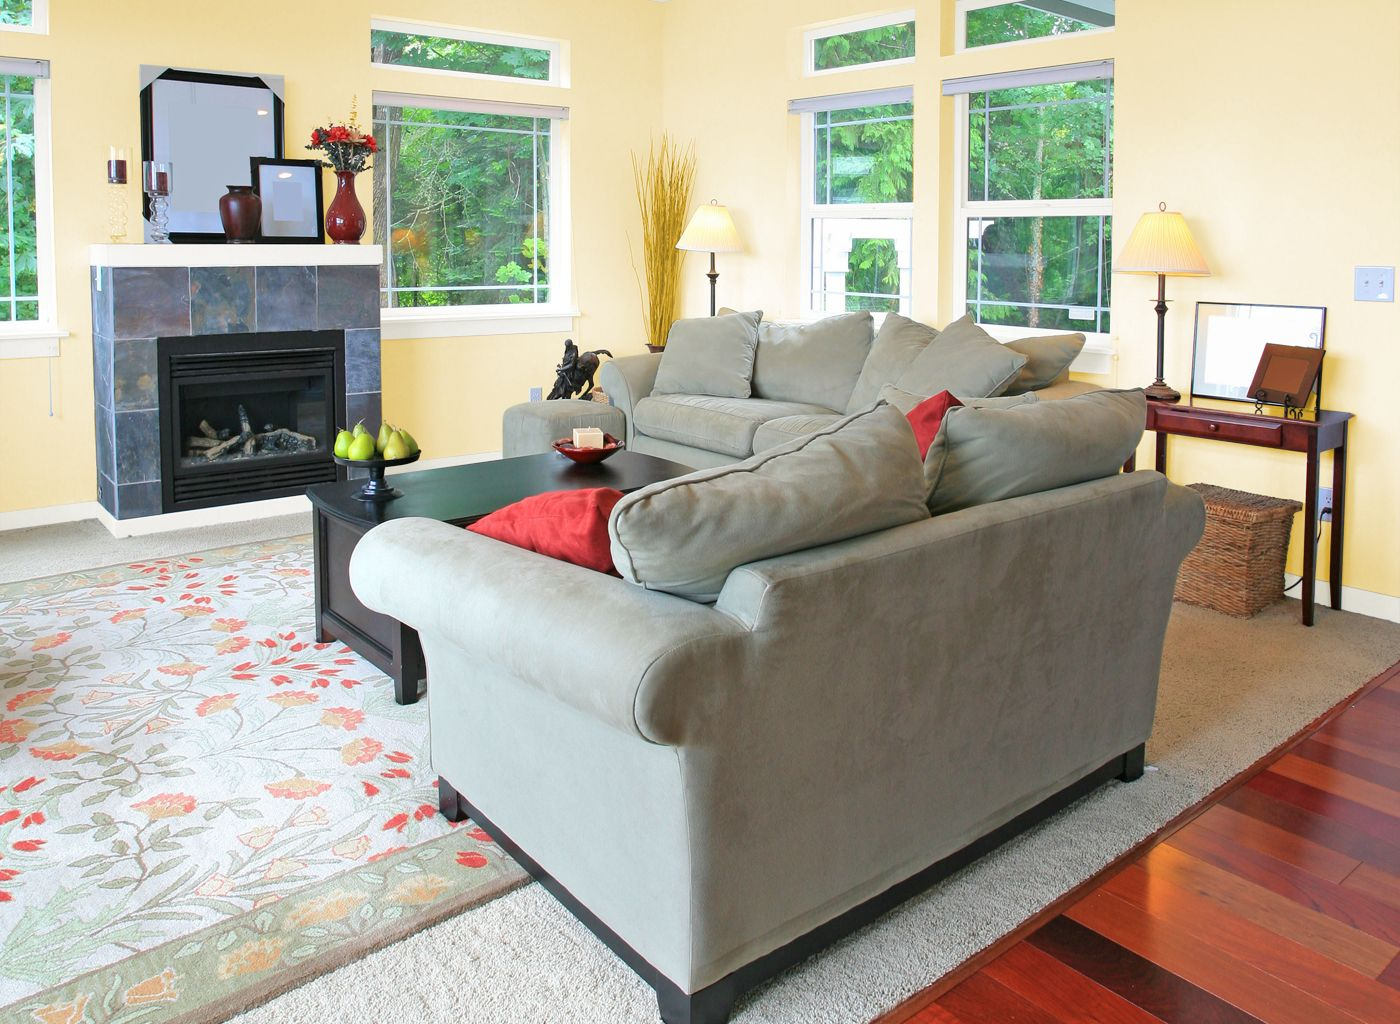 Living Room in Boston Cream | Living room, Room, Home decor